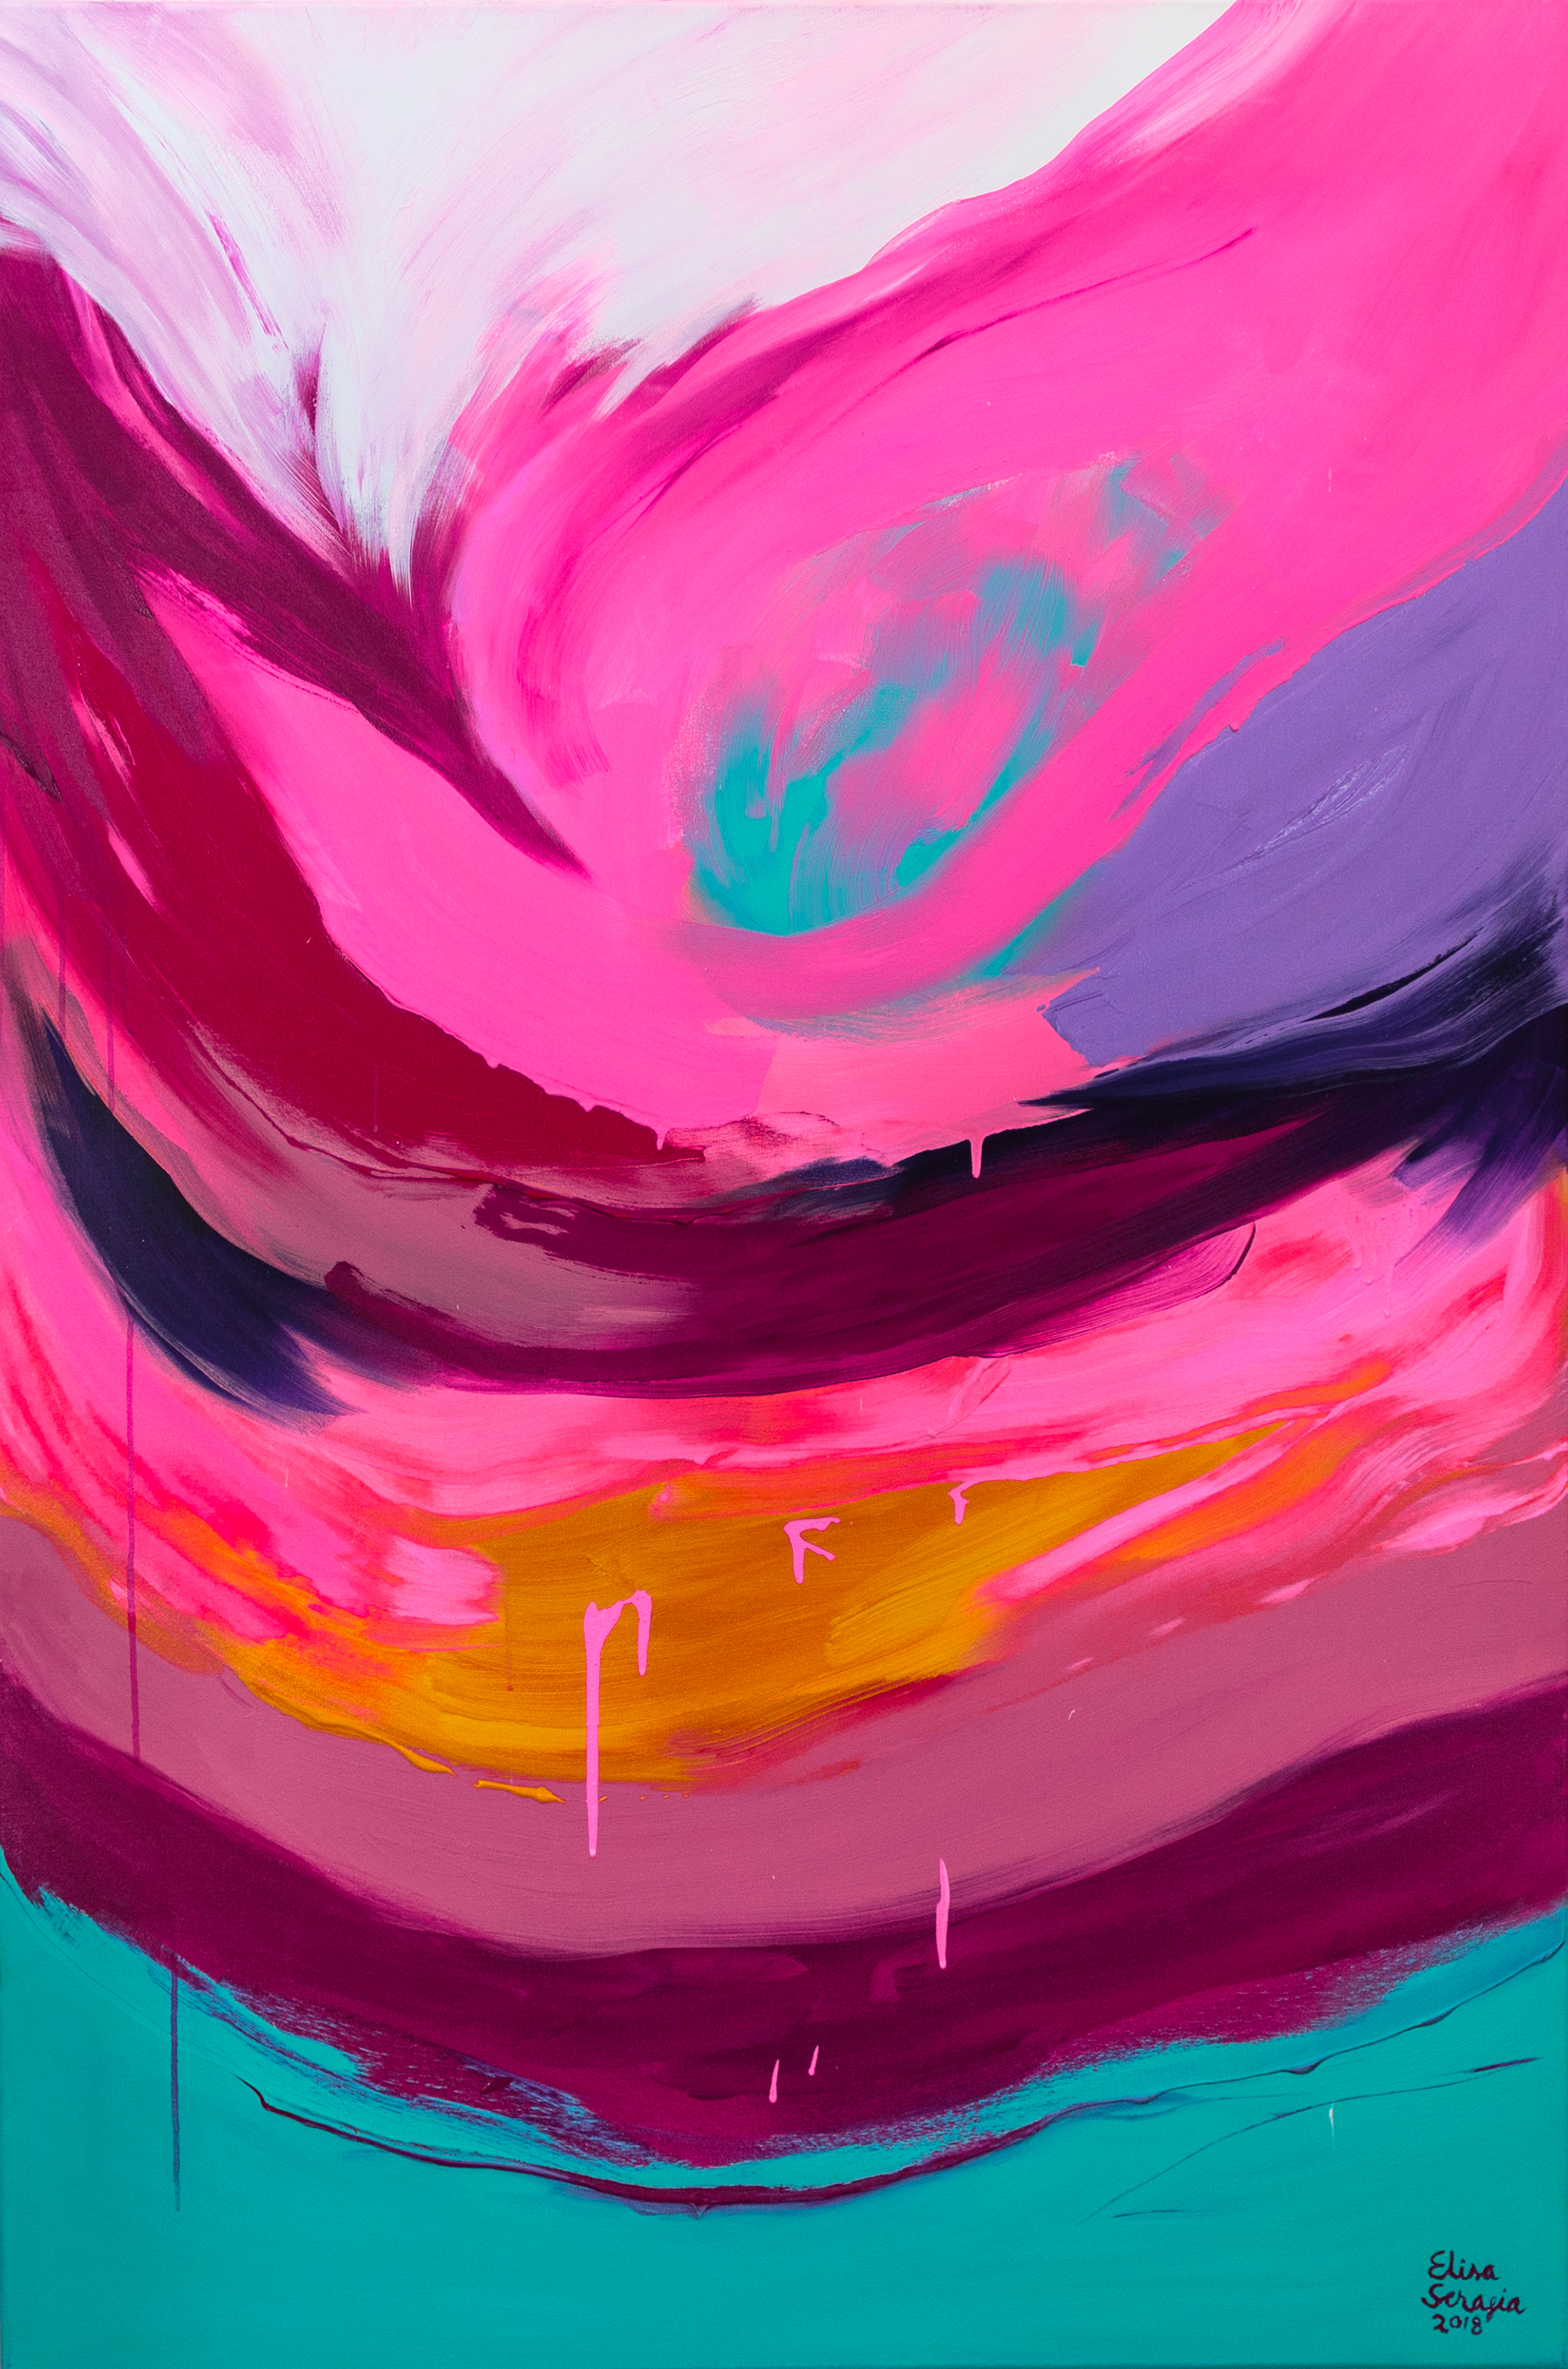 Aurora, Akryyli kankaalle, 150 cm x 100 cm  Myyty /Sold